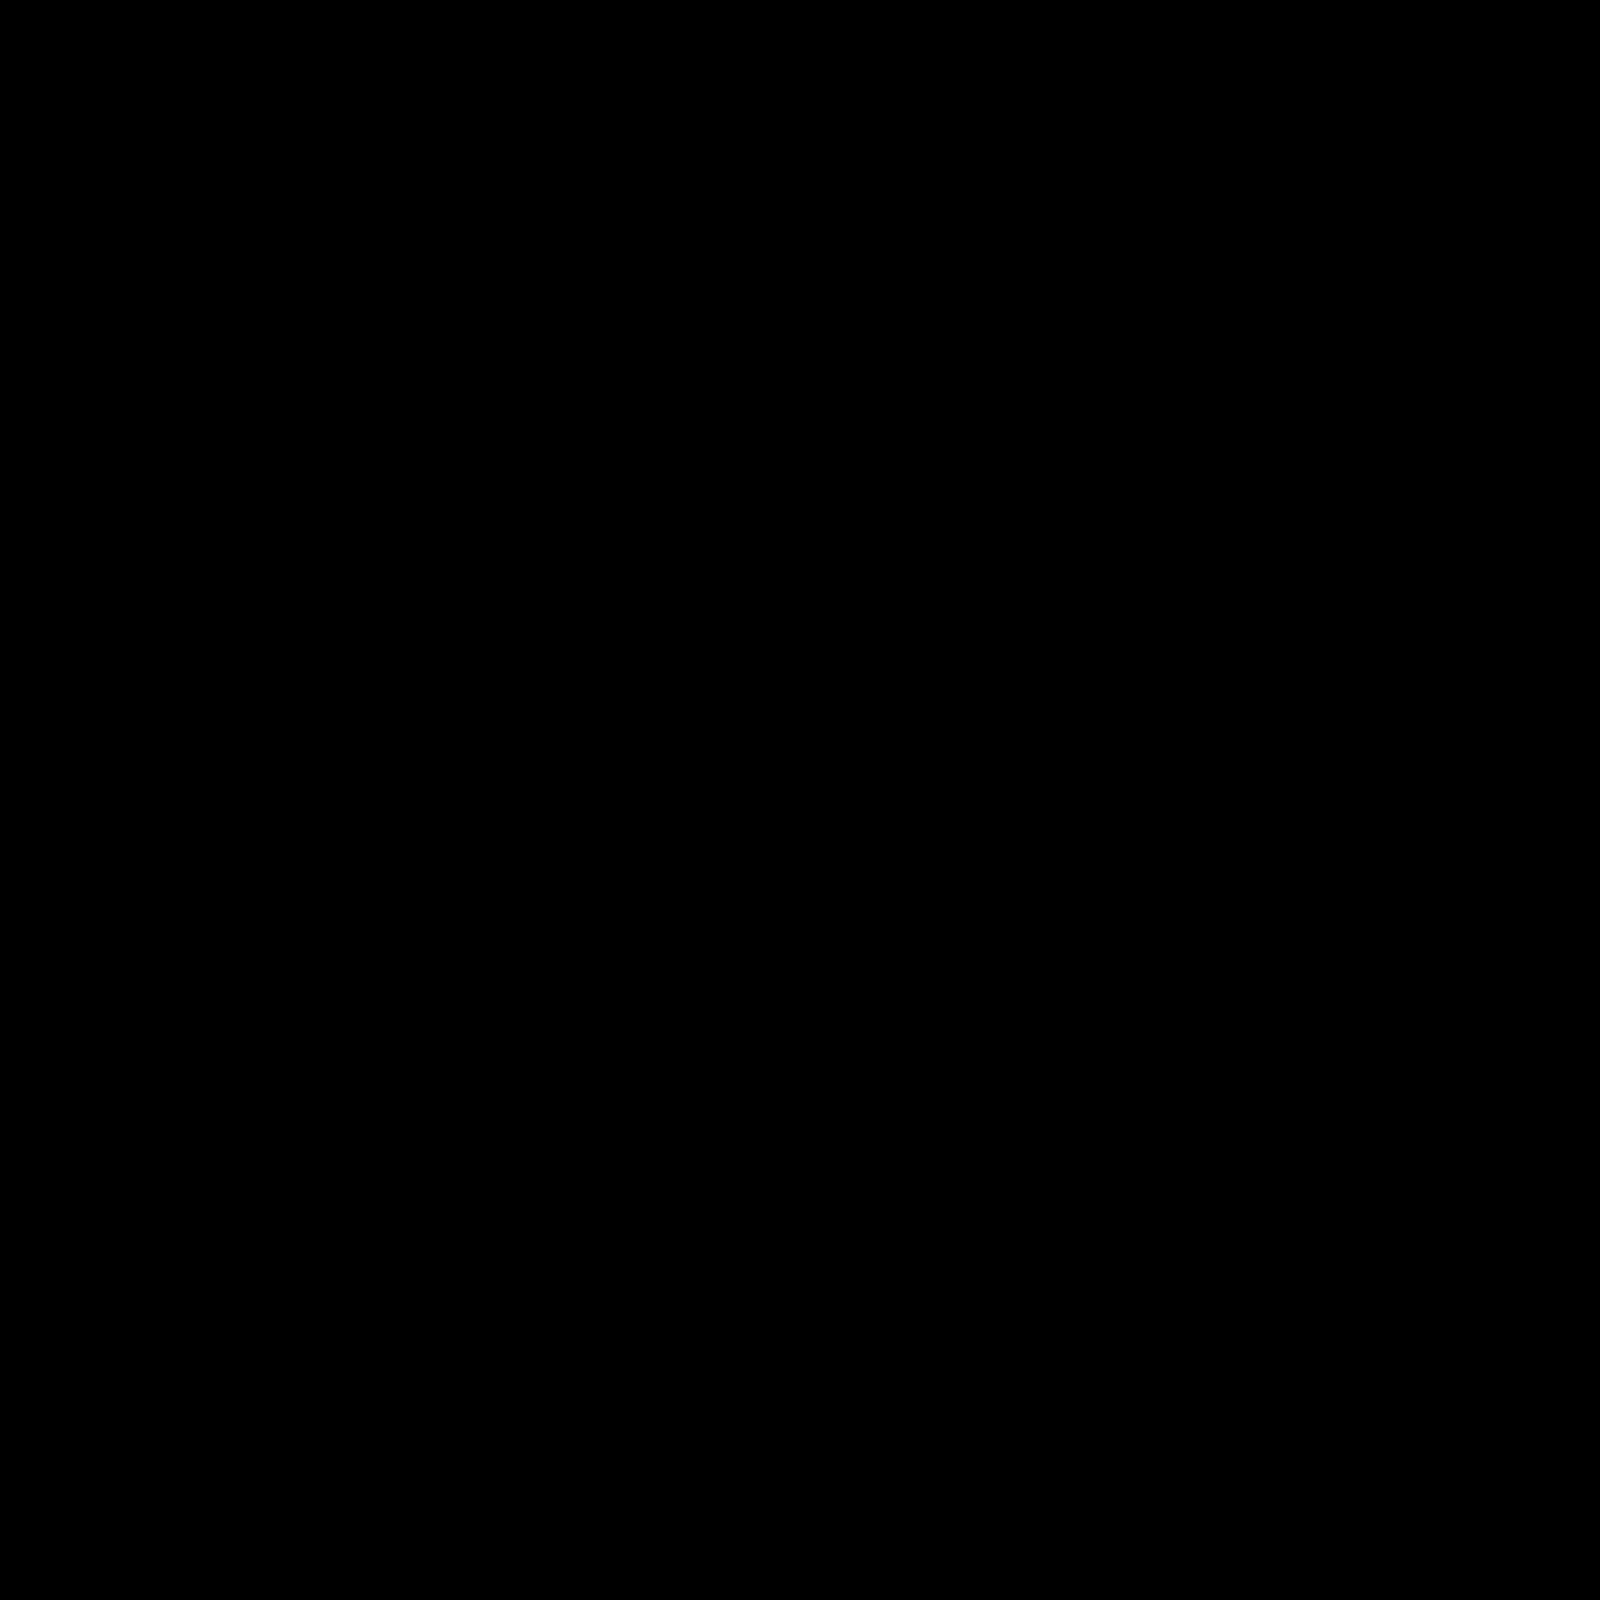 Vegetarian Food Symbol icon